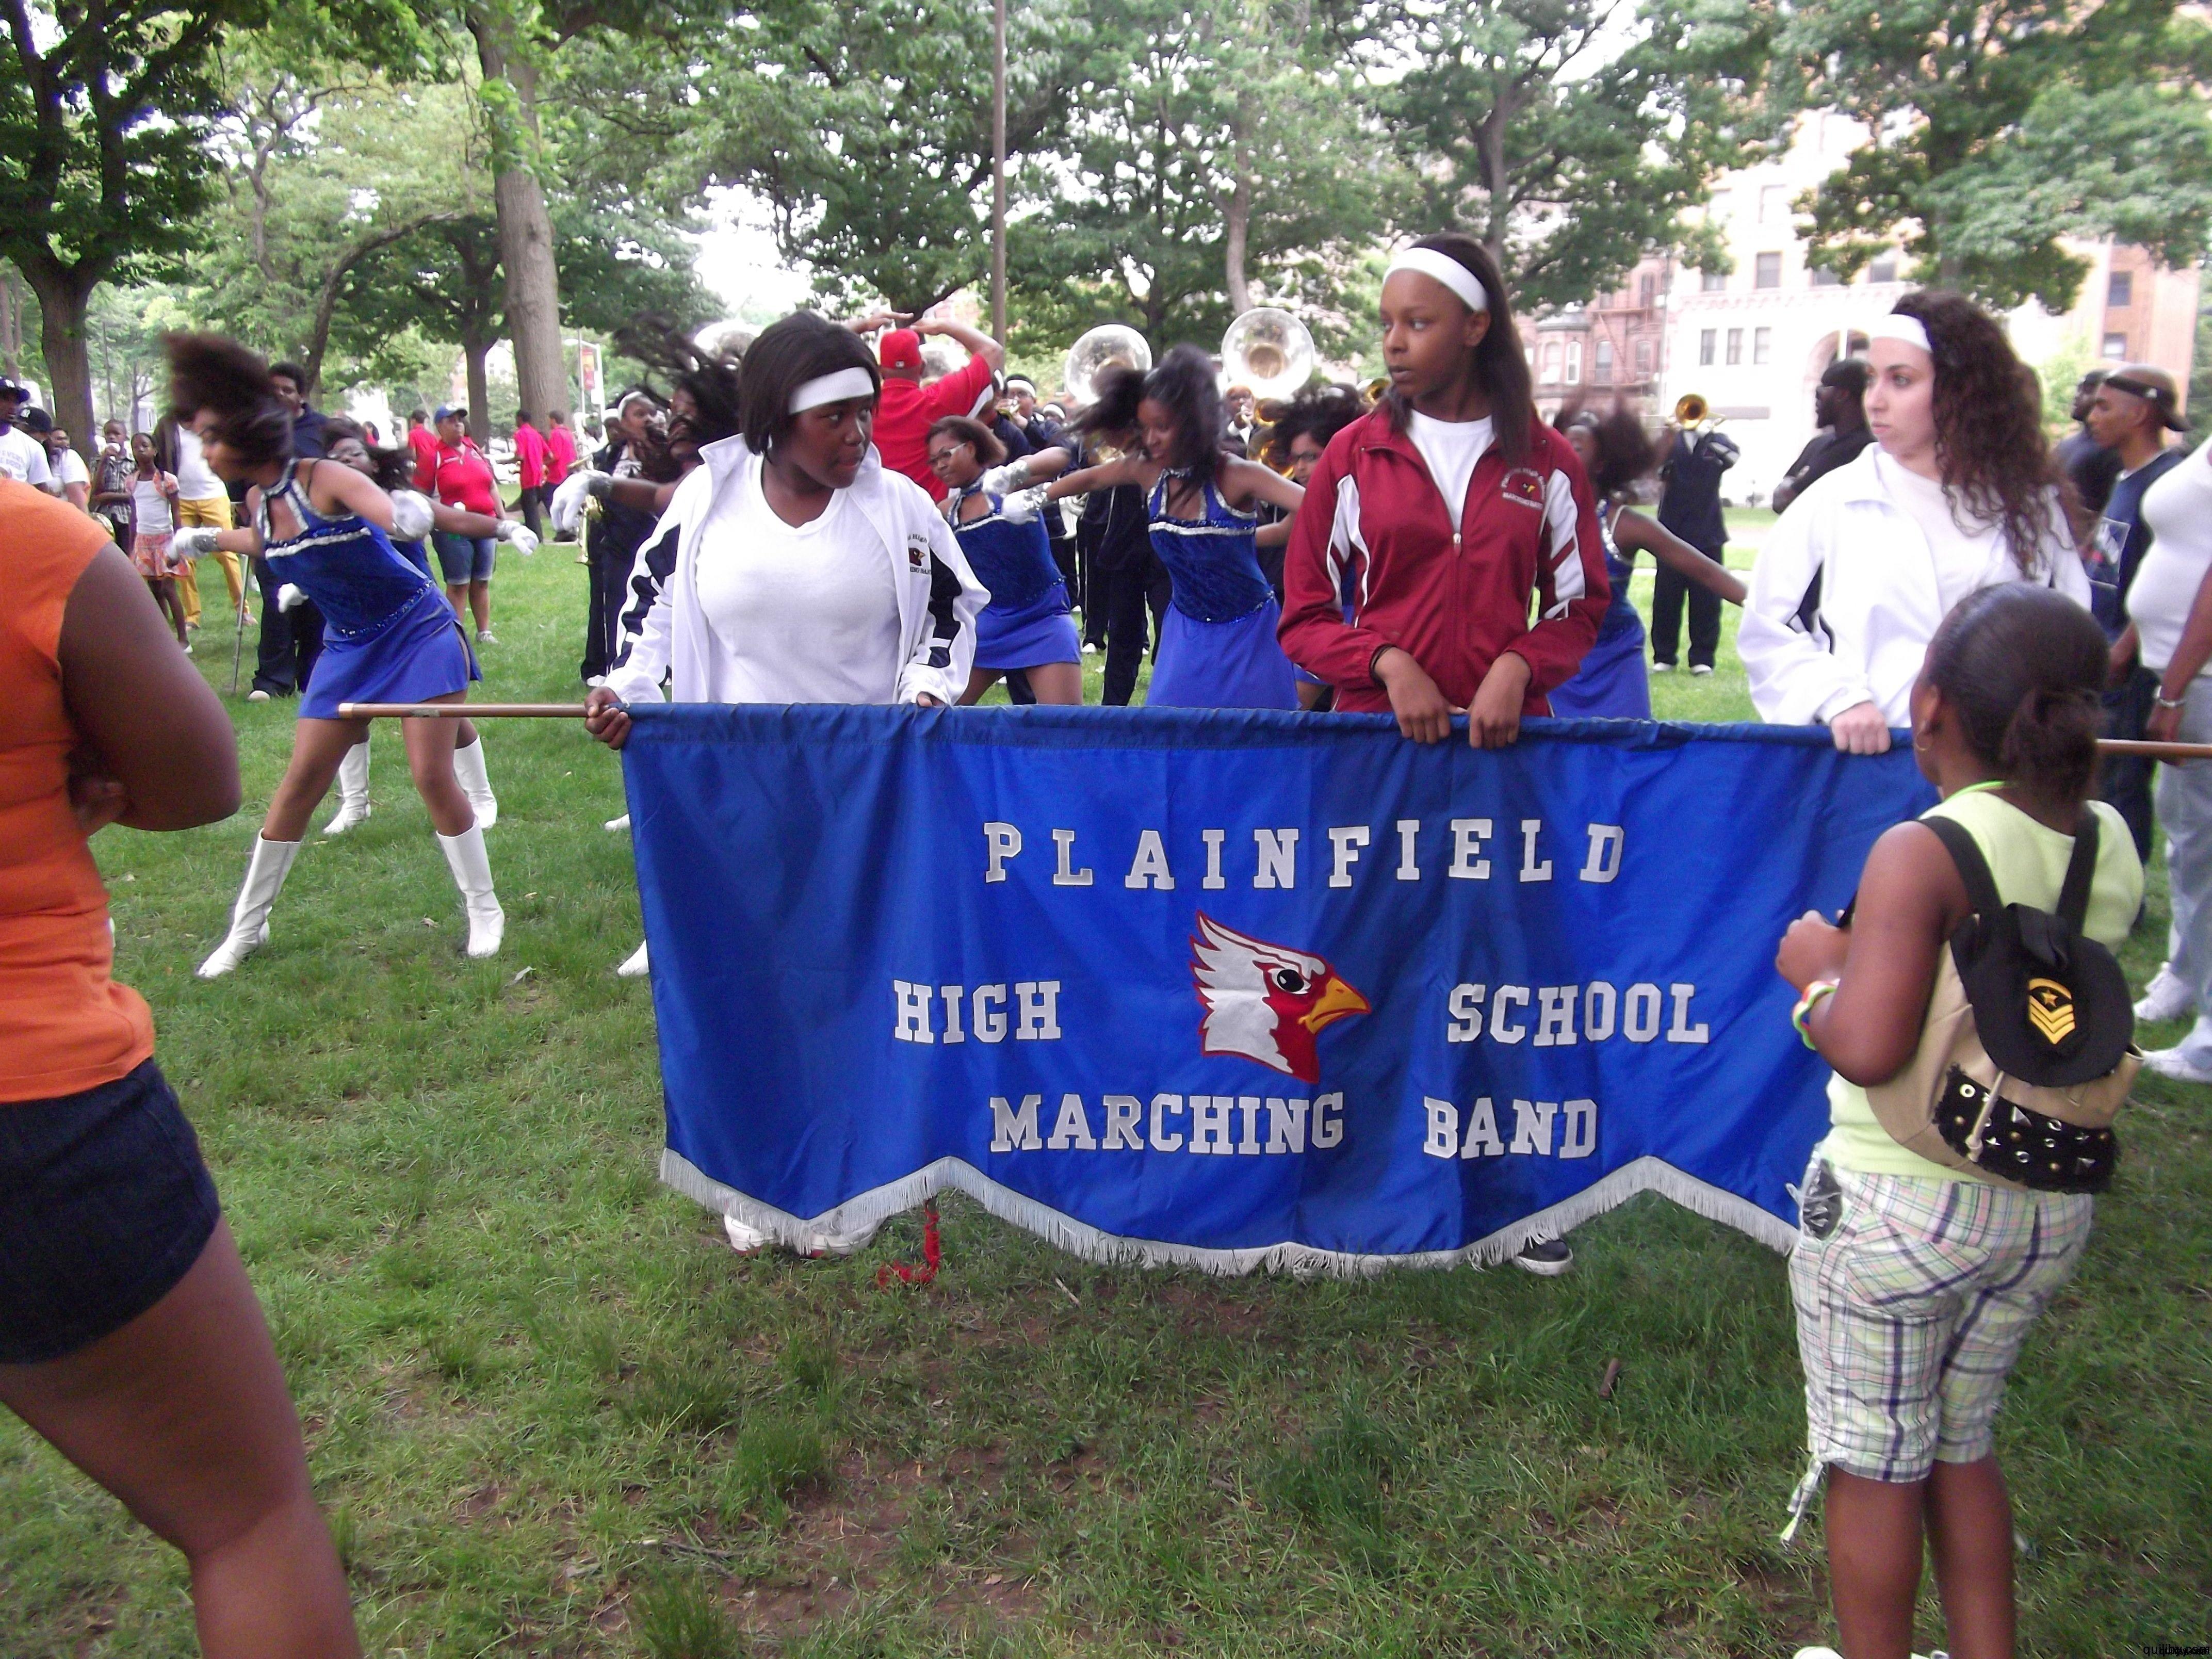 Plainfield High School Marching Band